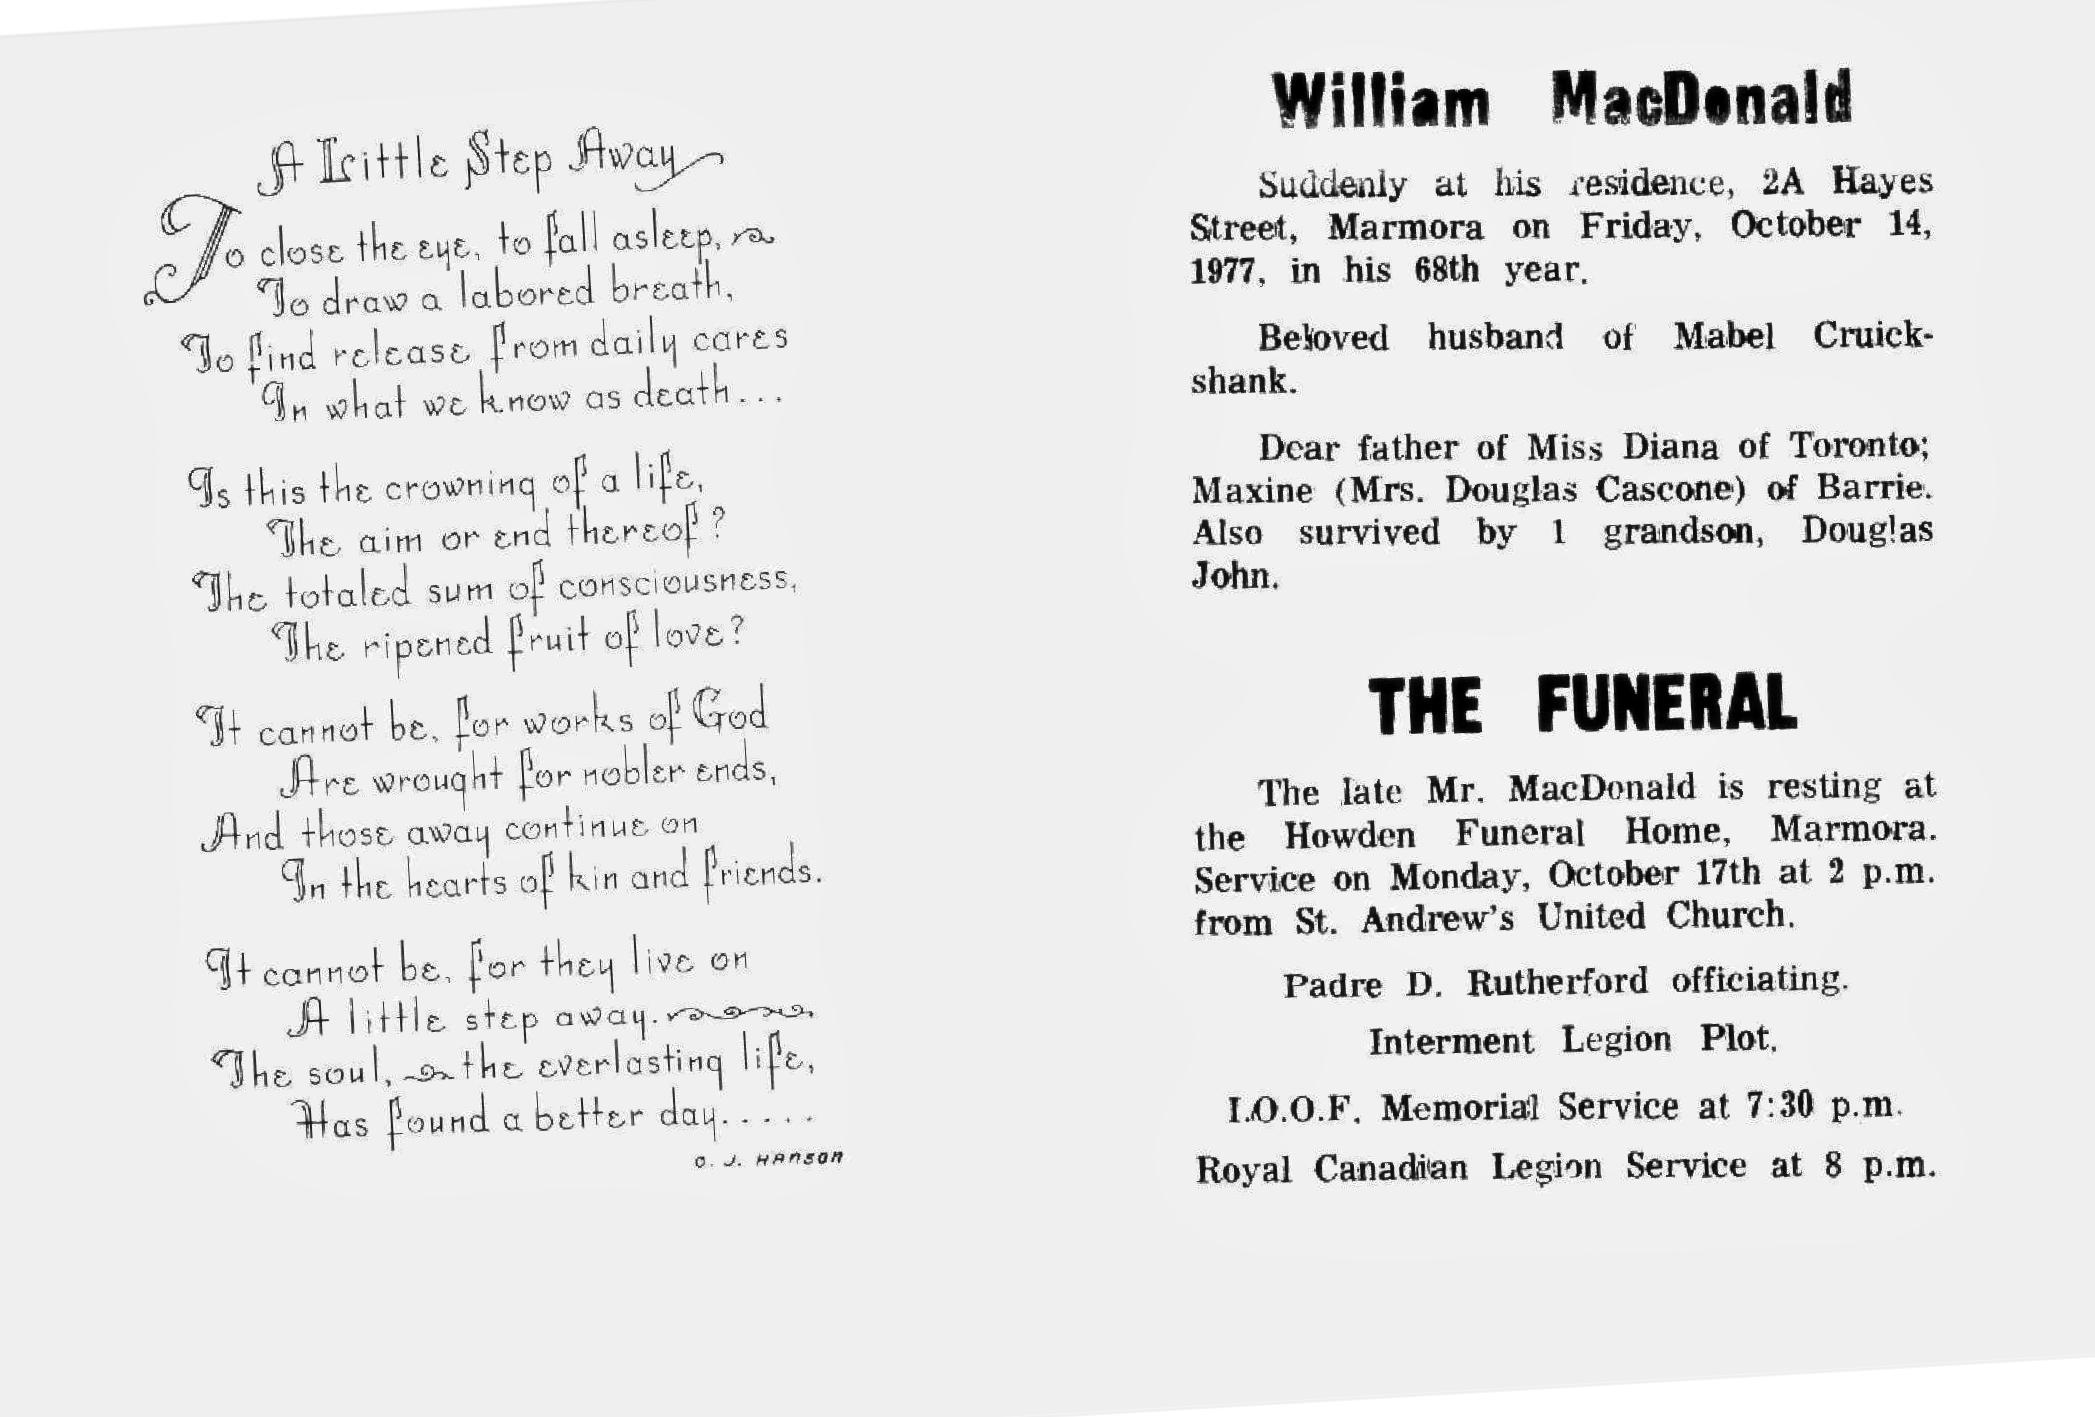 MacDonald,  William                             x.jpg